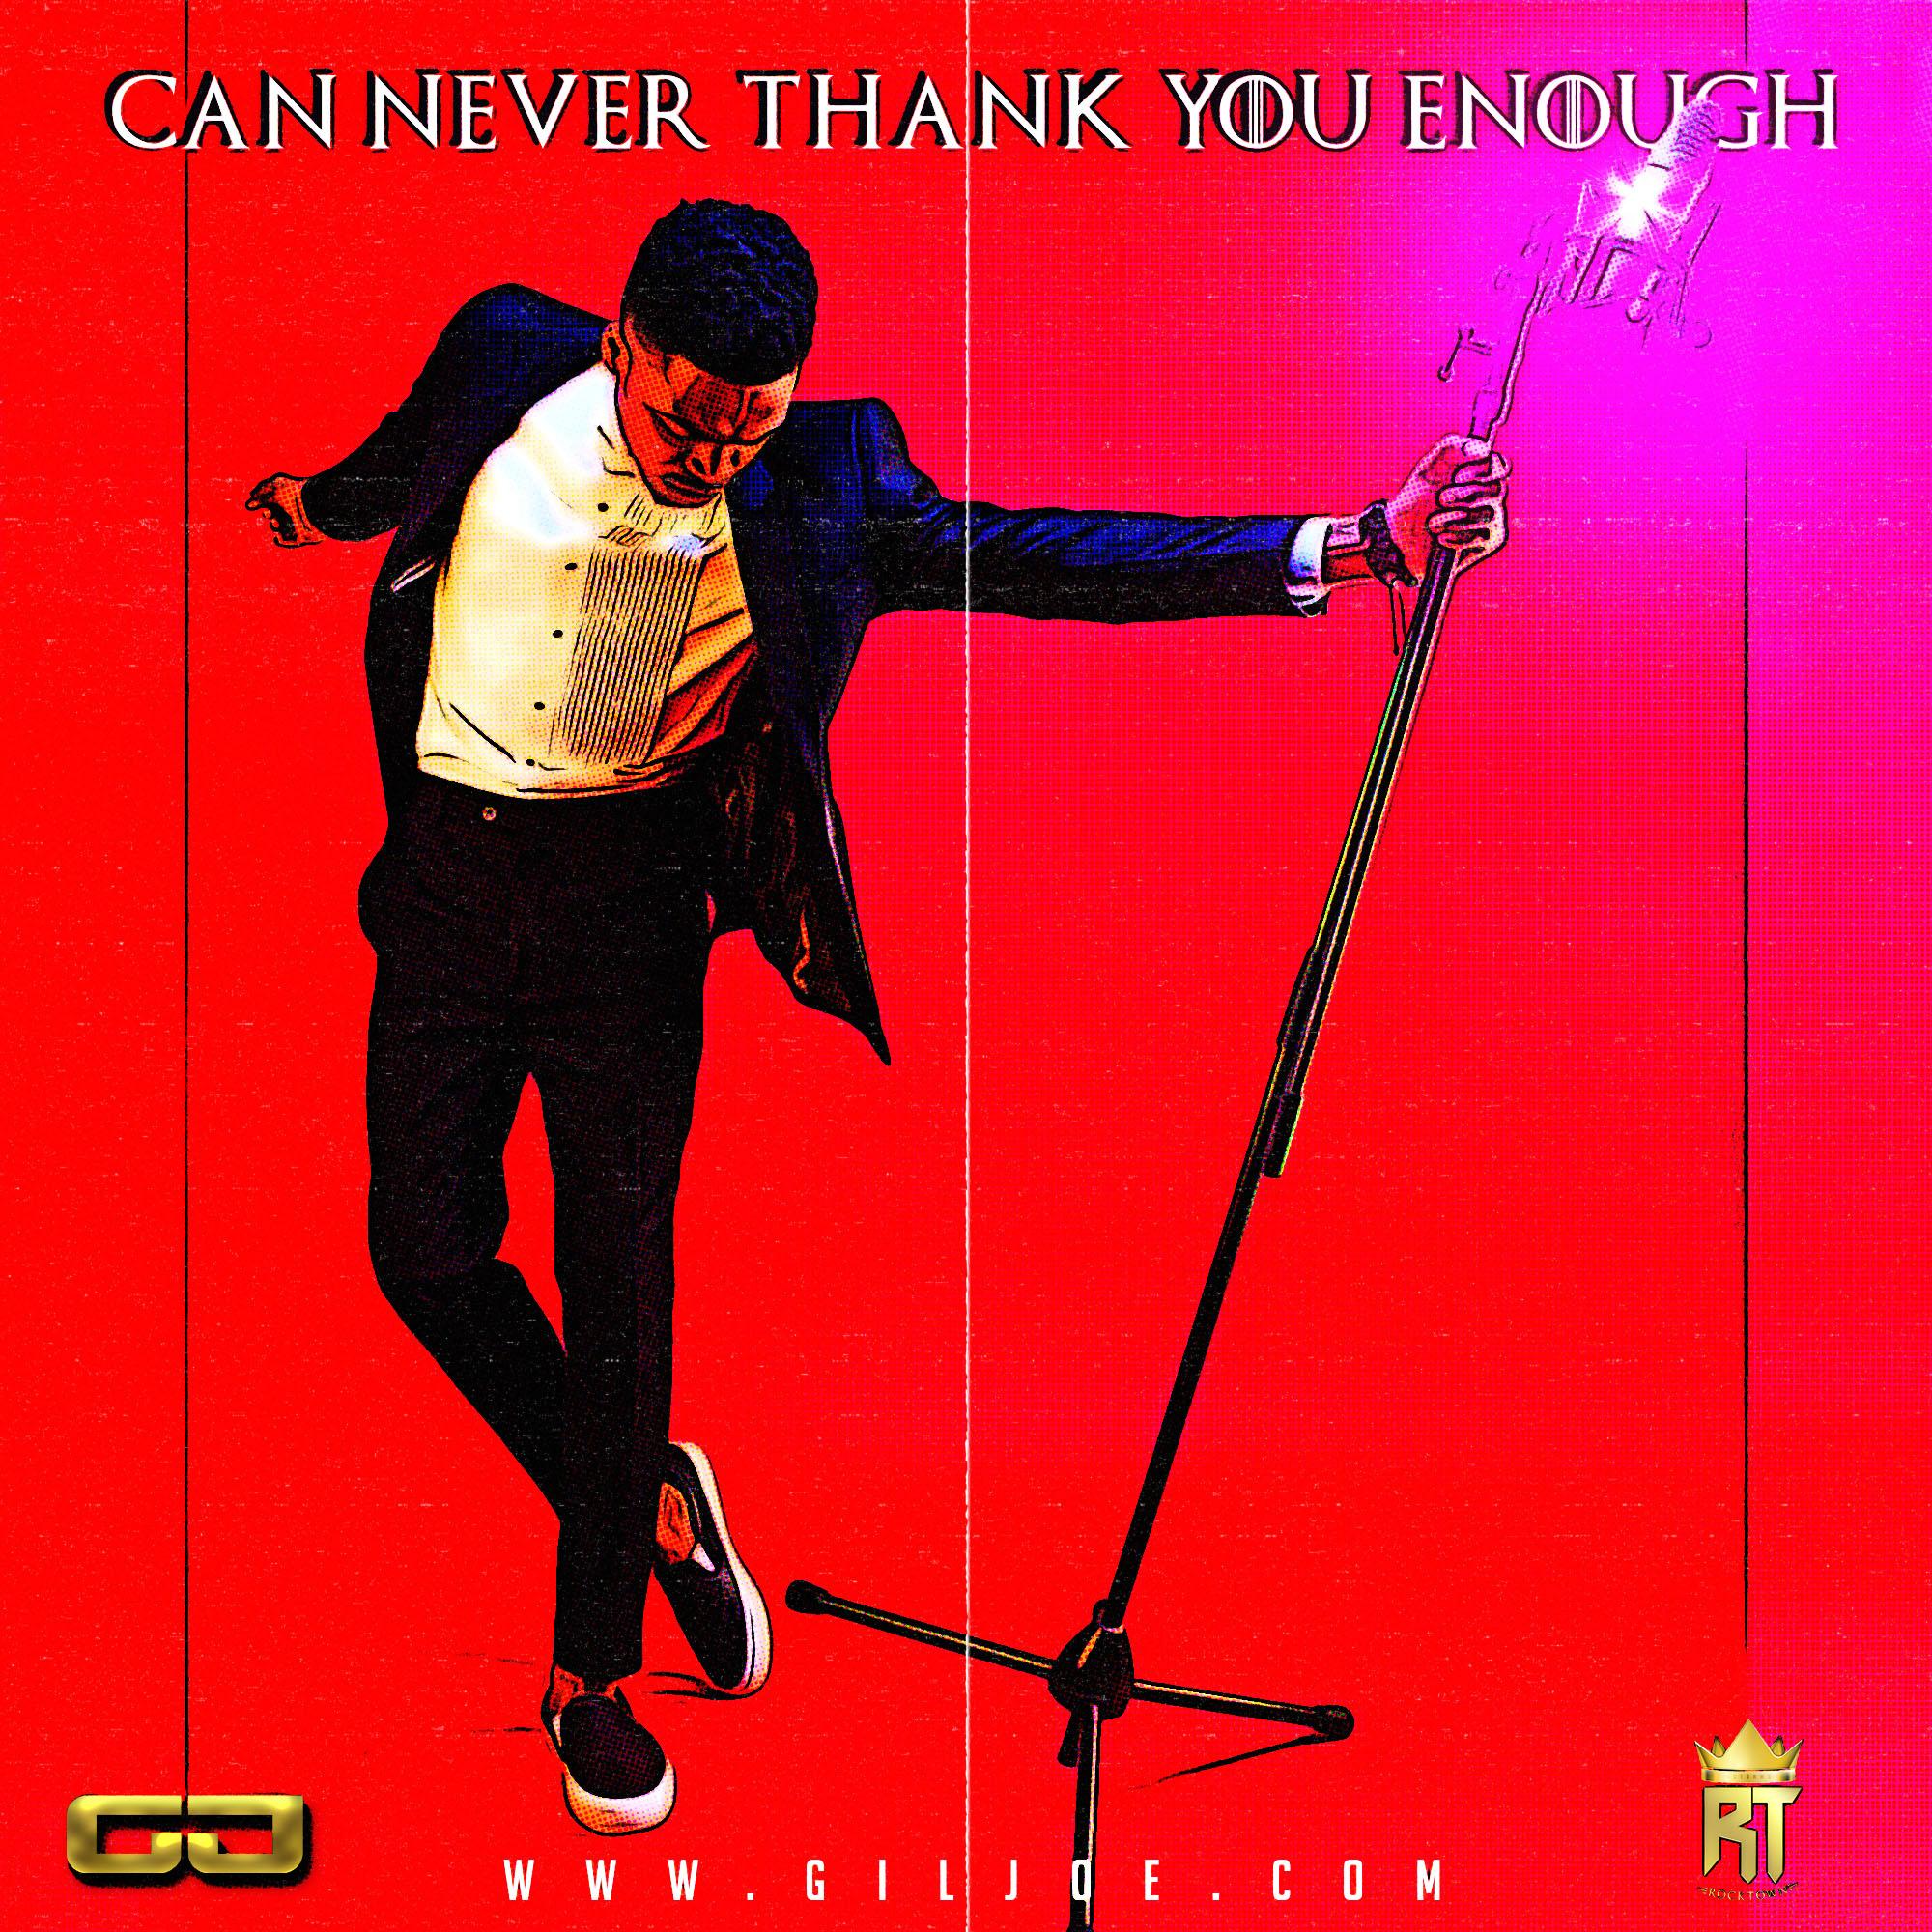 Can Never Thank You Enough – Gil Joe